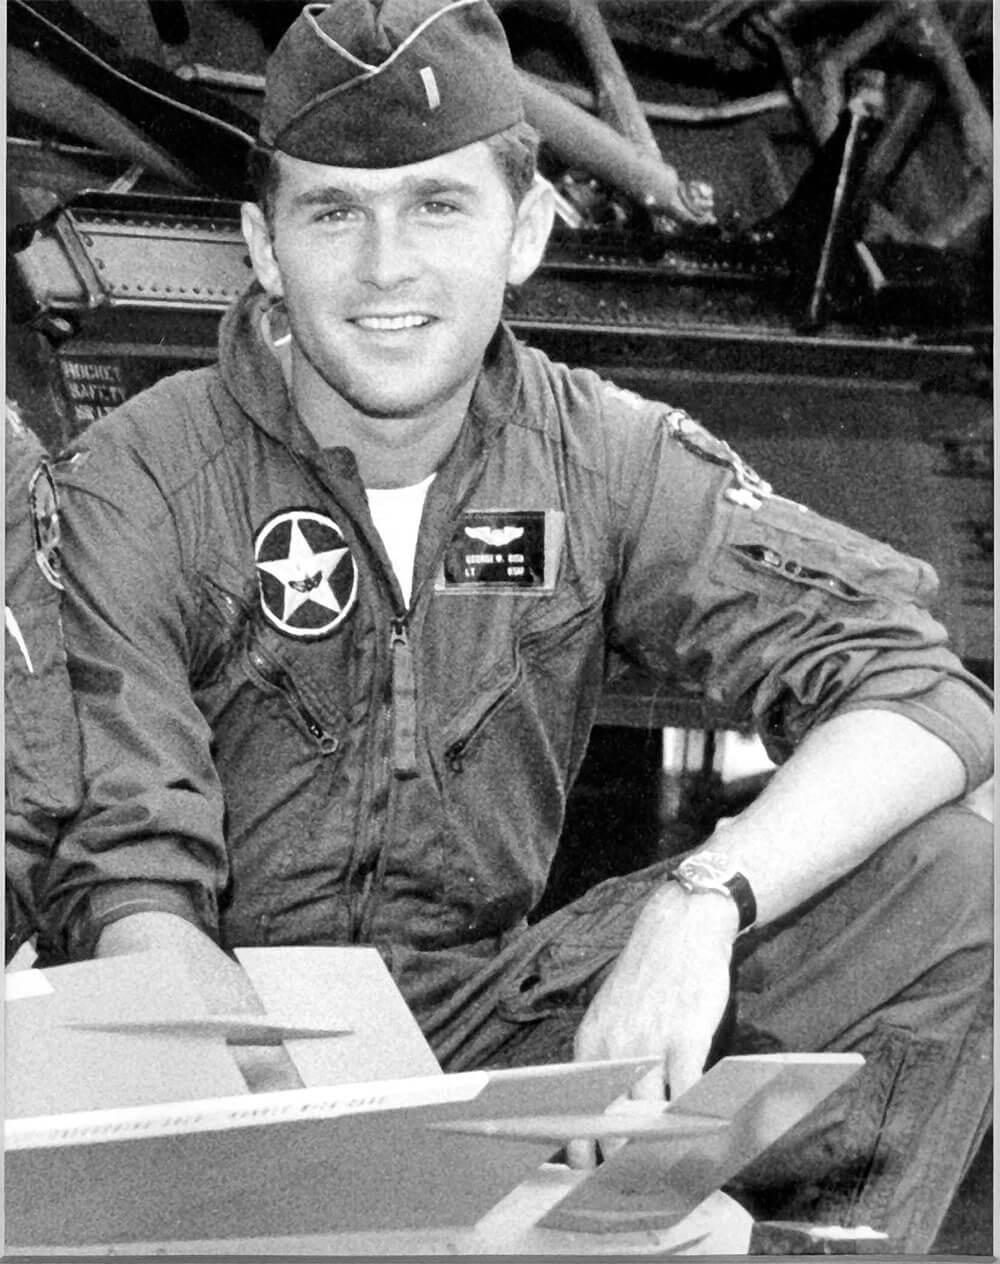 Photo courtesy U.S. Air Force